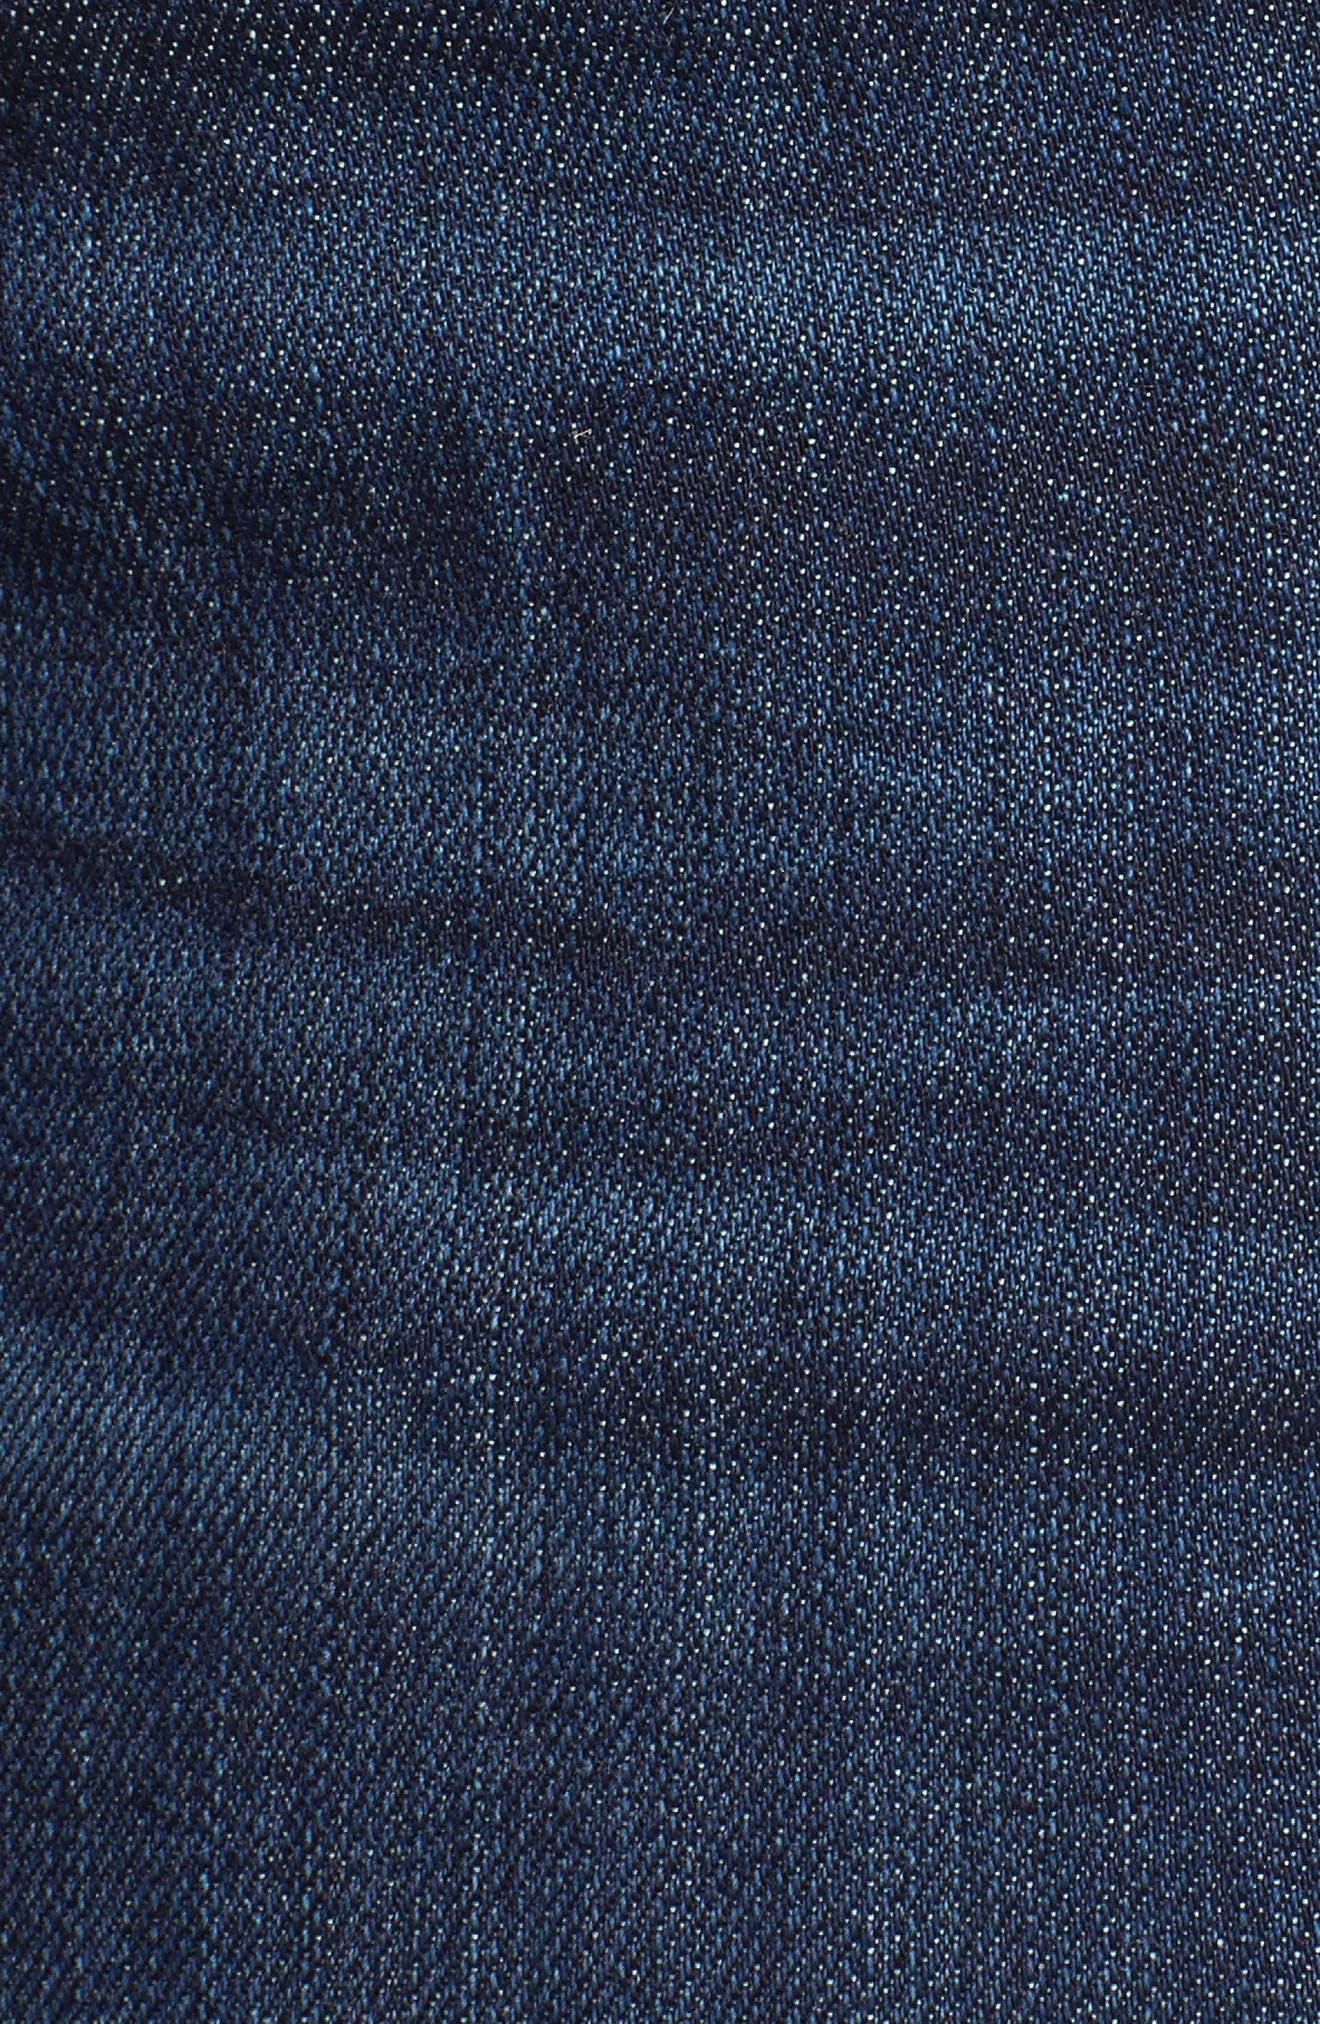 Catherine Boyfriend Jeans,                             Alternate thumbnail 6, color,                             Overt Dark Stone Base Wash